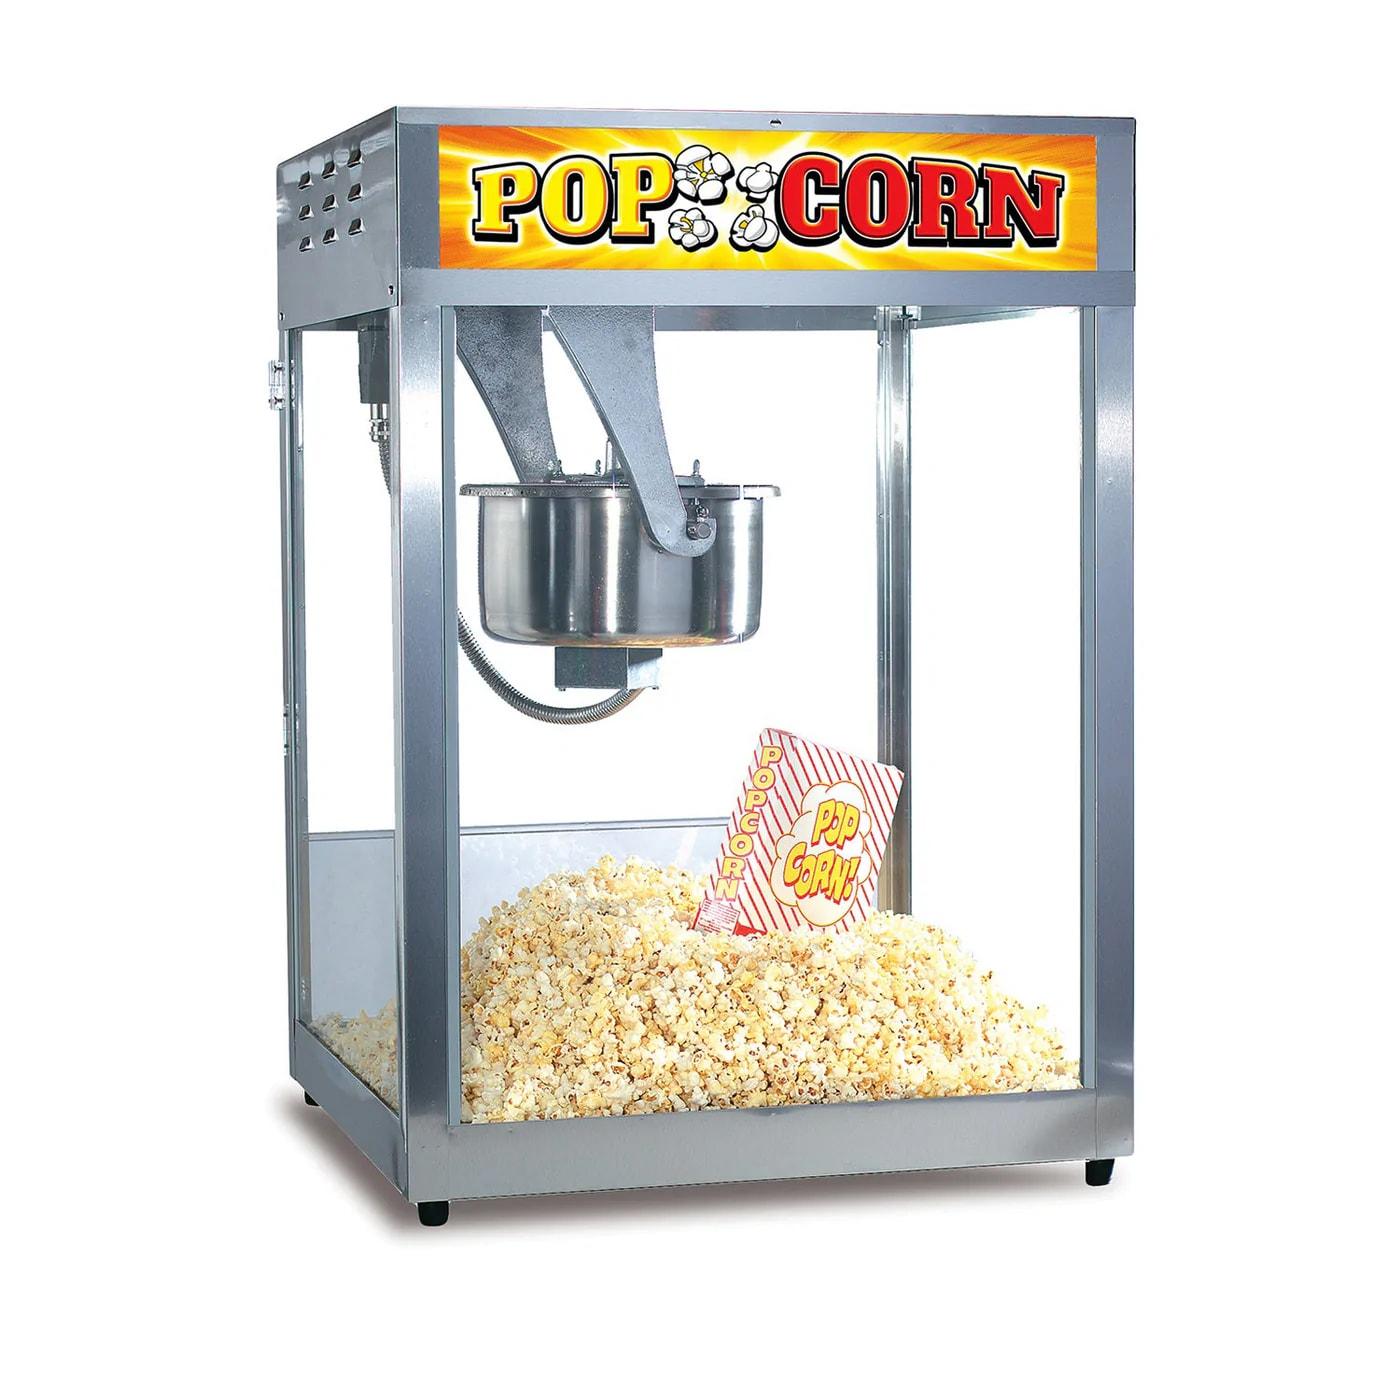 Gold Medal 2553 Popcorn Machine, 16/18-oz EZ Kleen Kettle, Oil Pre-Wired, 120v